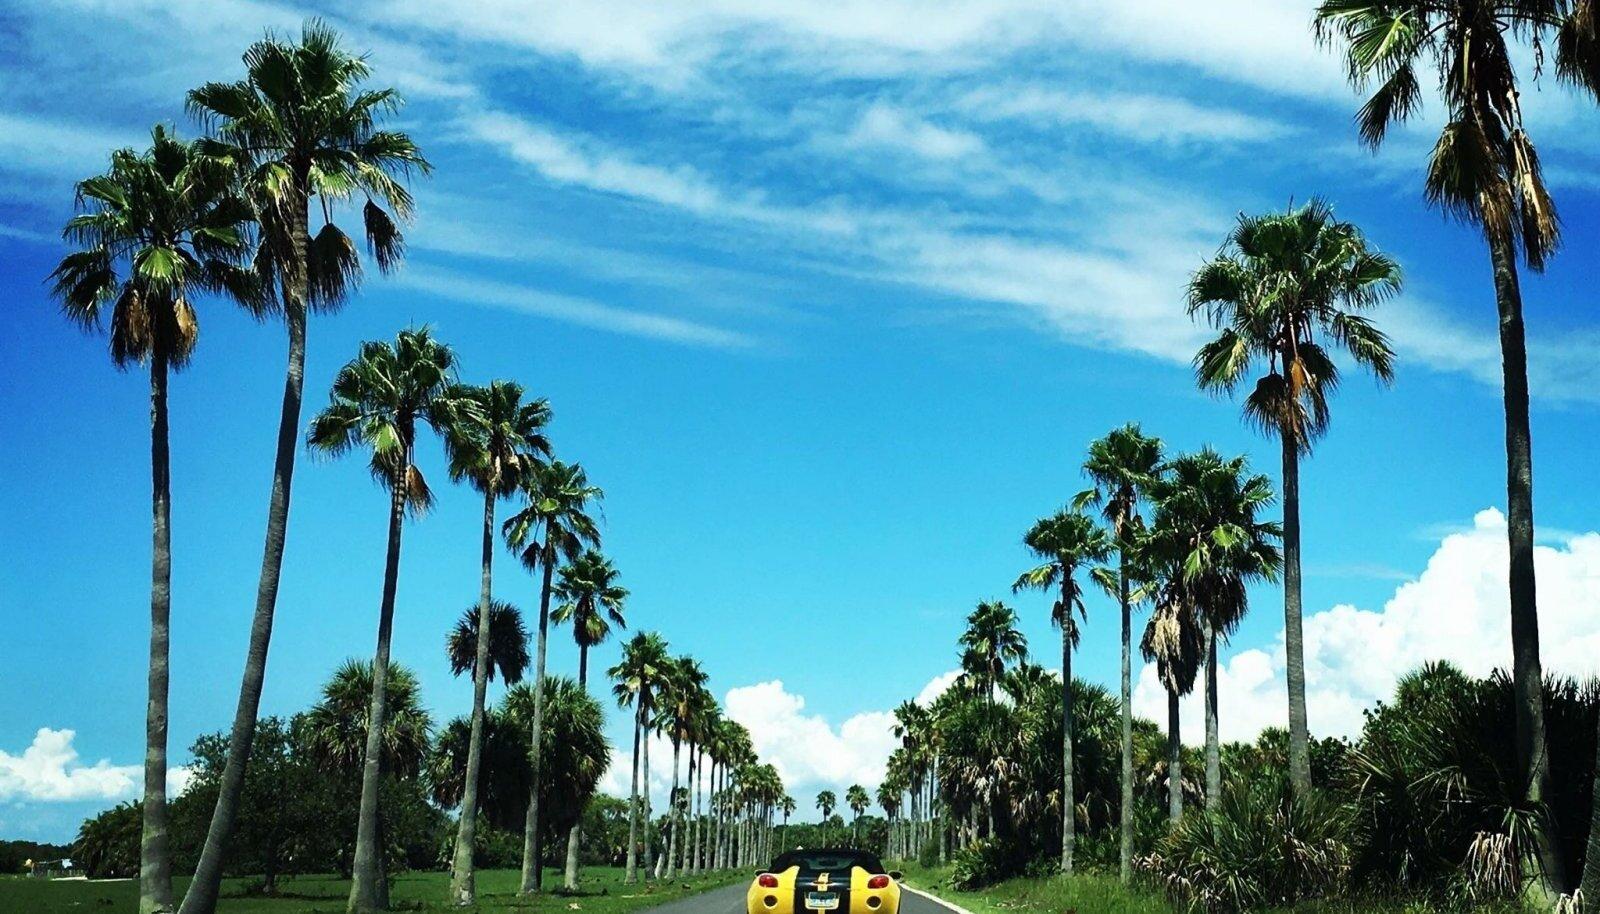 PÄRAST TORMI: Kollane sportauto kollase päikese all Fort de Sotos Floridas.